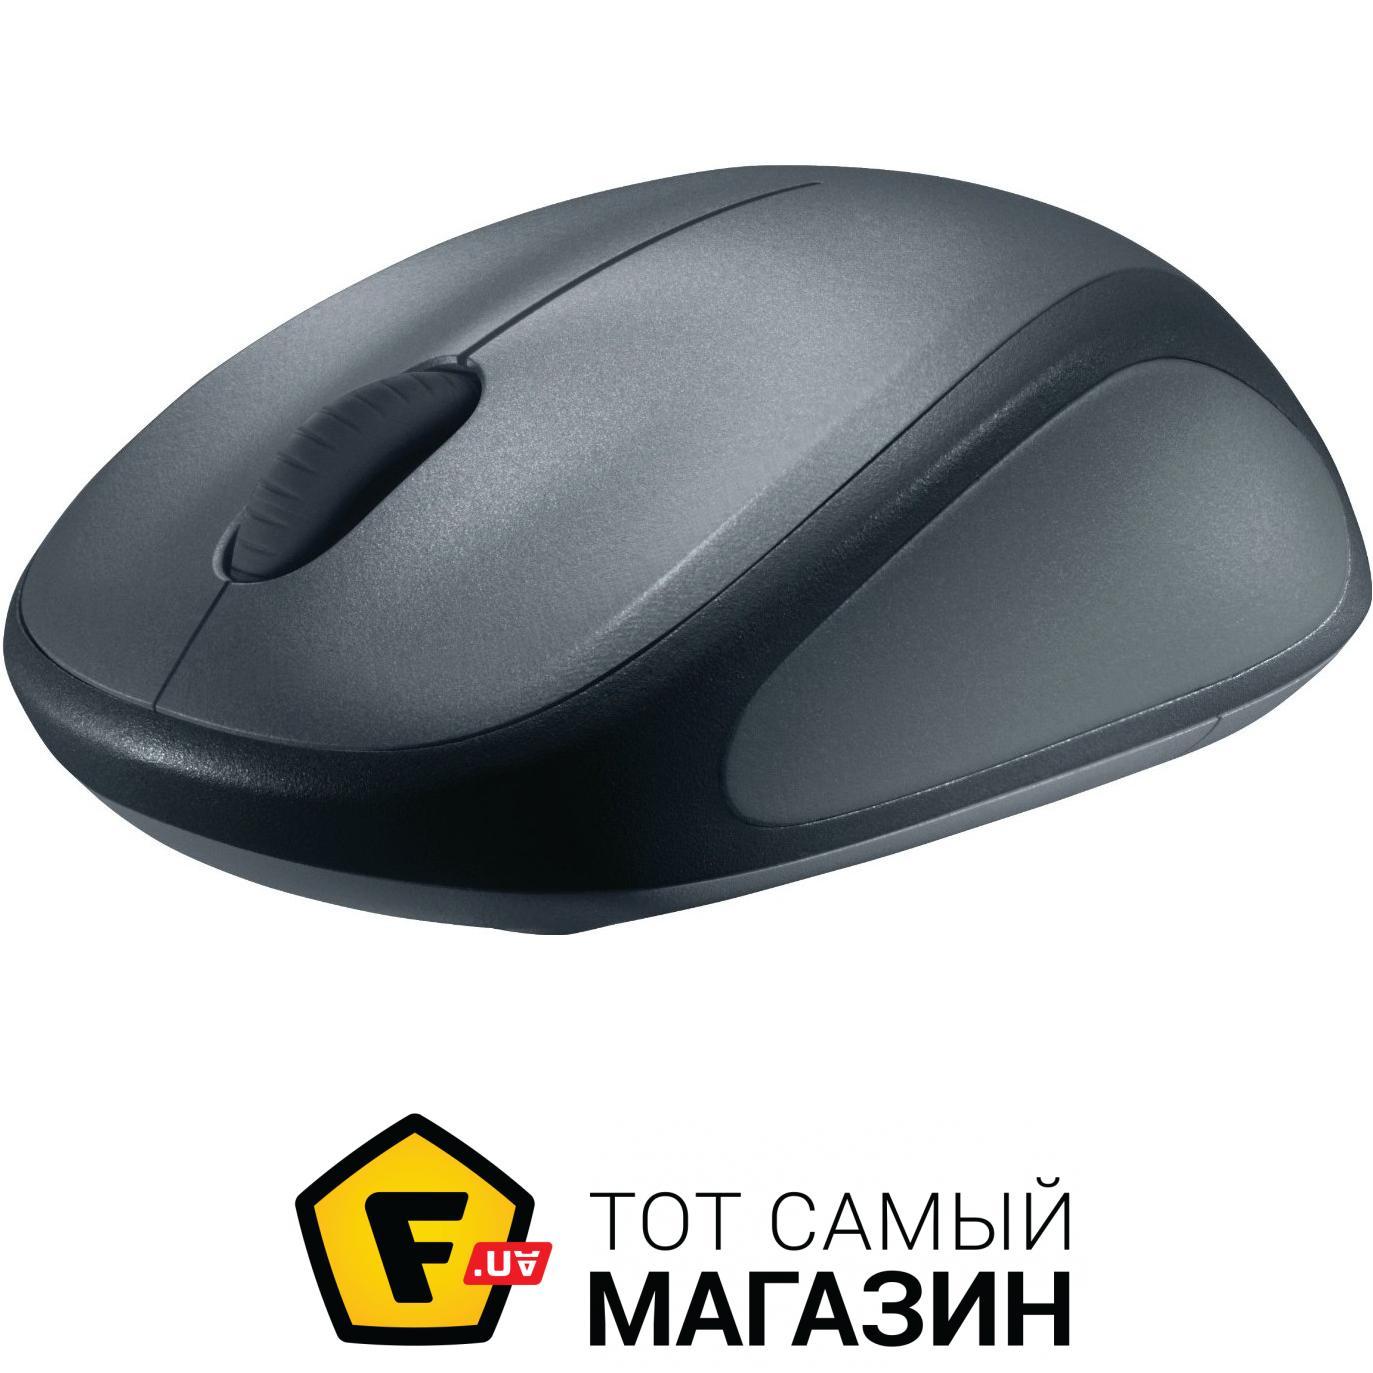 Мышь (910-004879) Logitech Wireless Mouse M220 SILENT Blue